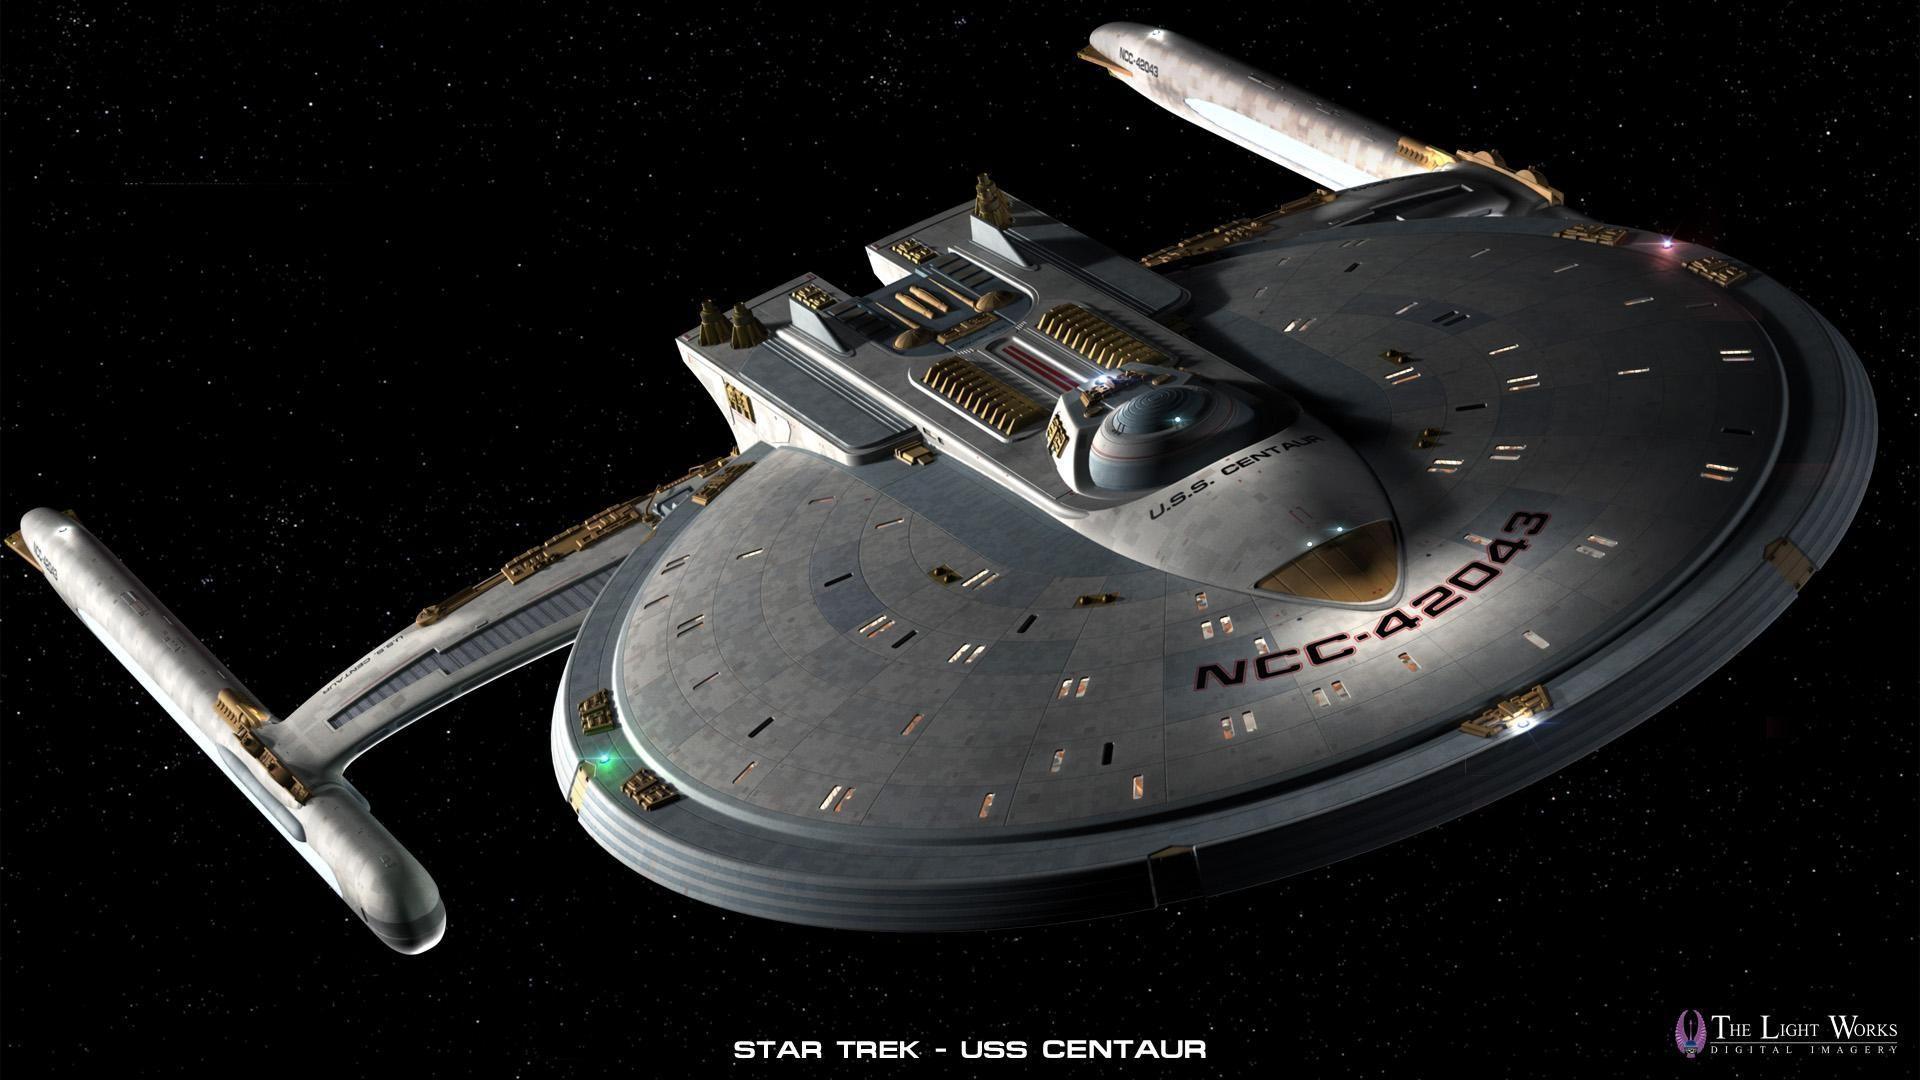 uss centaur (star trek) [1920x1080] need #iphone #6s #plus